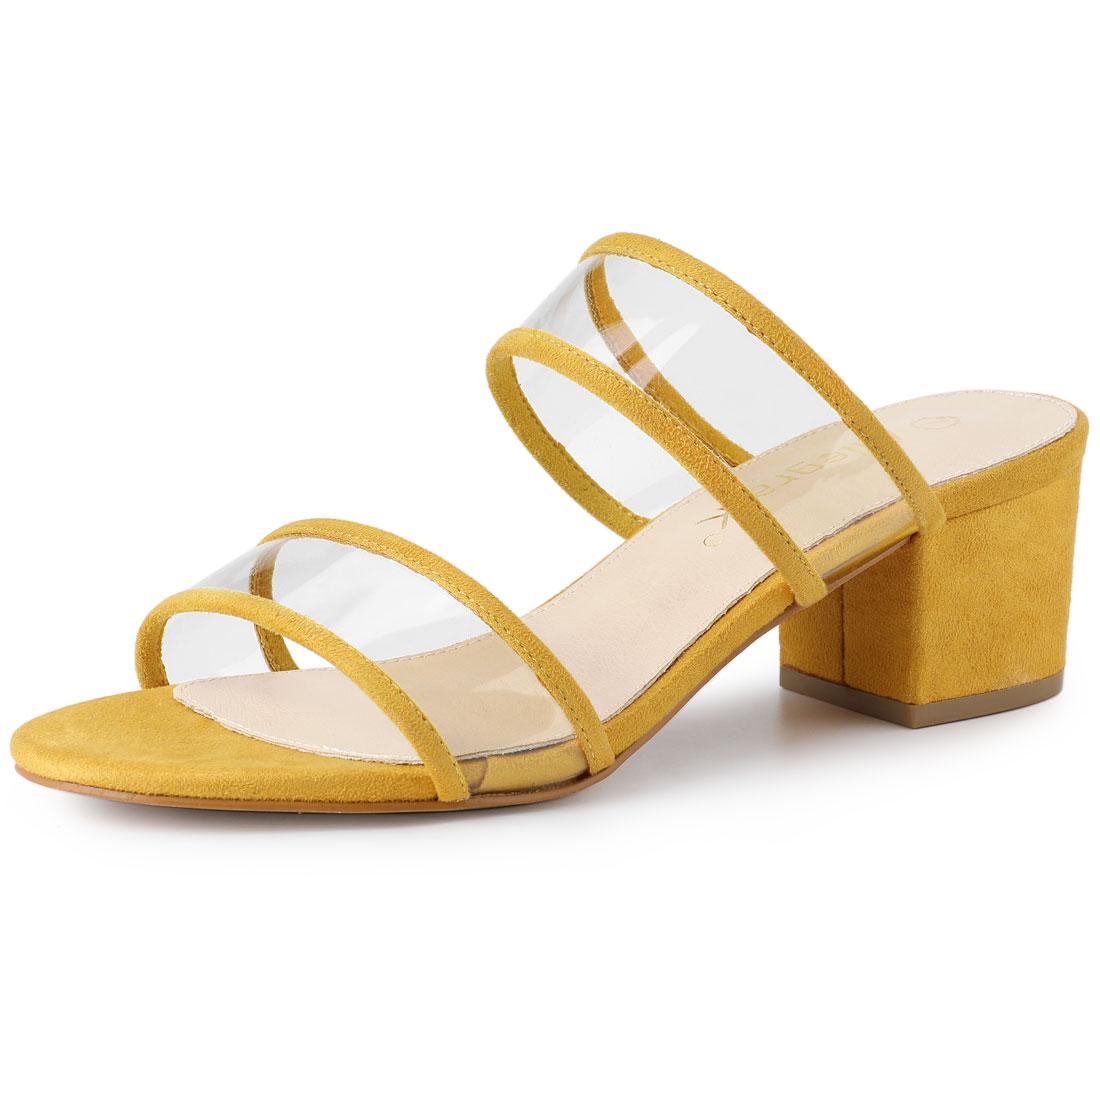 Allegra K Women's Clear Strap Block Heel Slide Sandals Yellow US 7